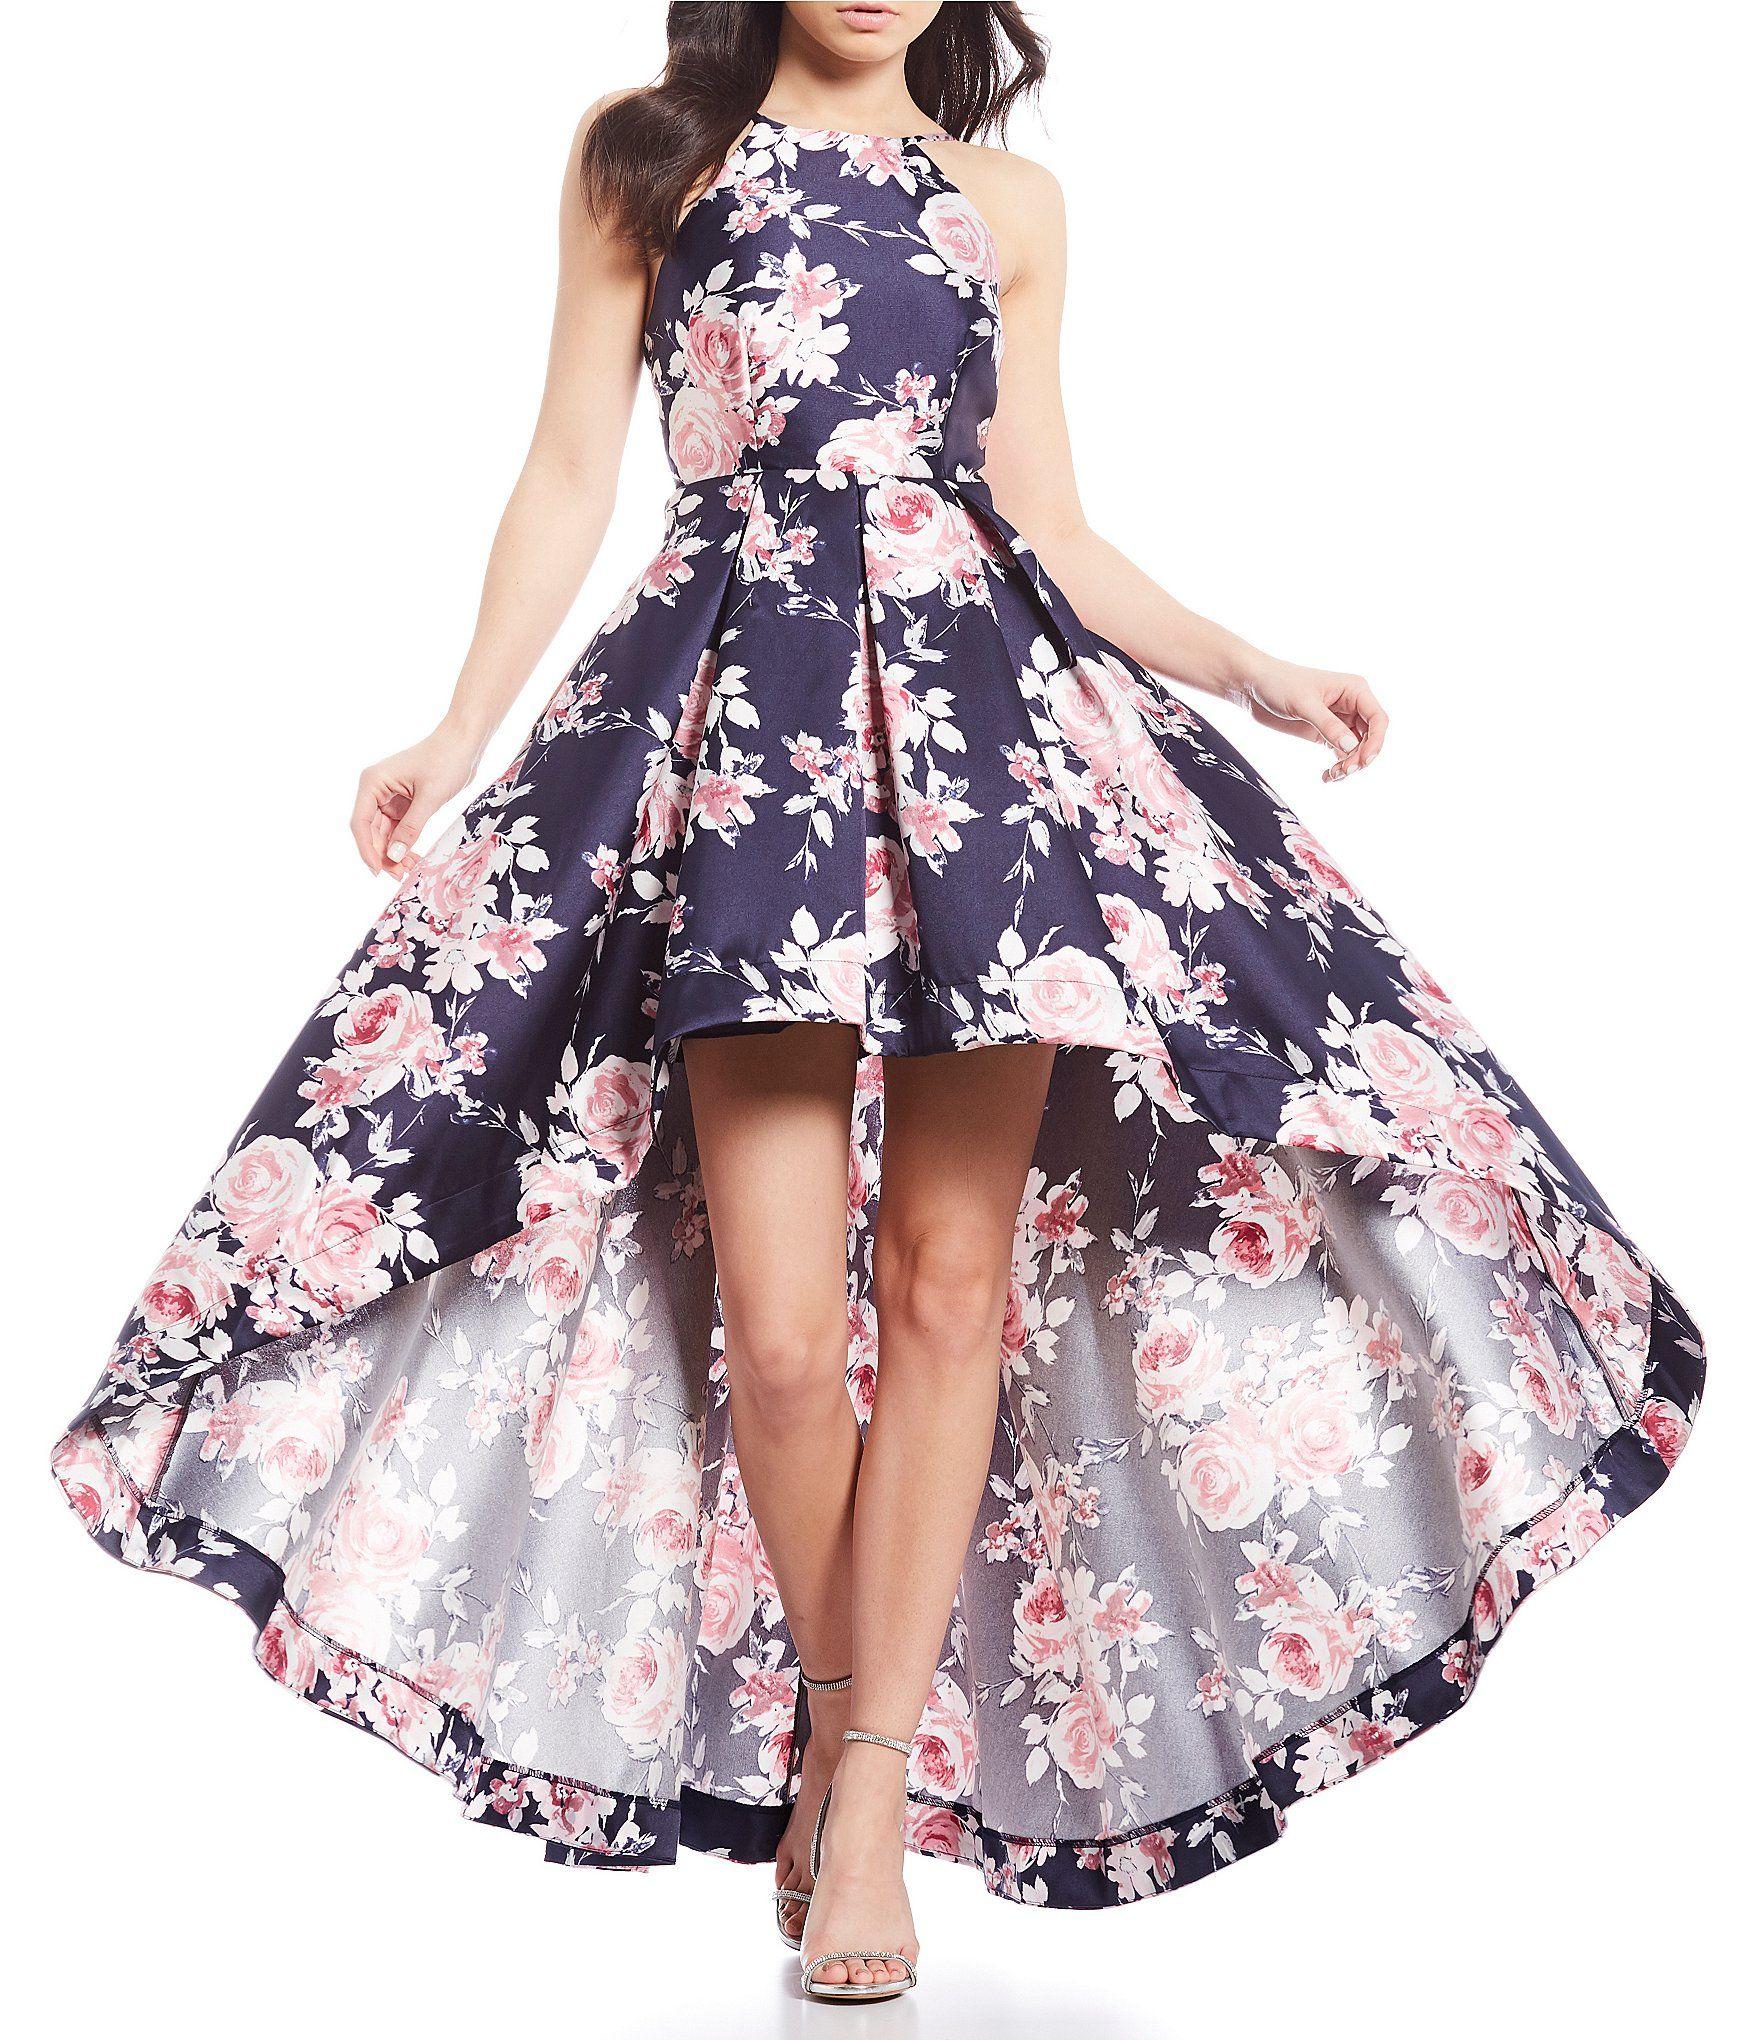 Shop For Xtraordinary High Neck Floral Print Long High Low Dress At Dillards Com Visit Dillards Co Formal Dresses Long High Low Prom Dresses Cute Prom Dresses [ 2040 x 1760 Pixel ]